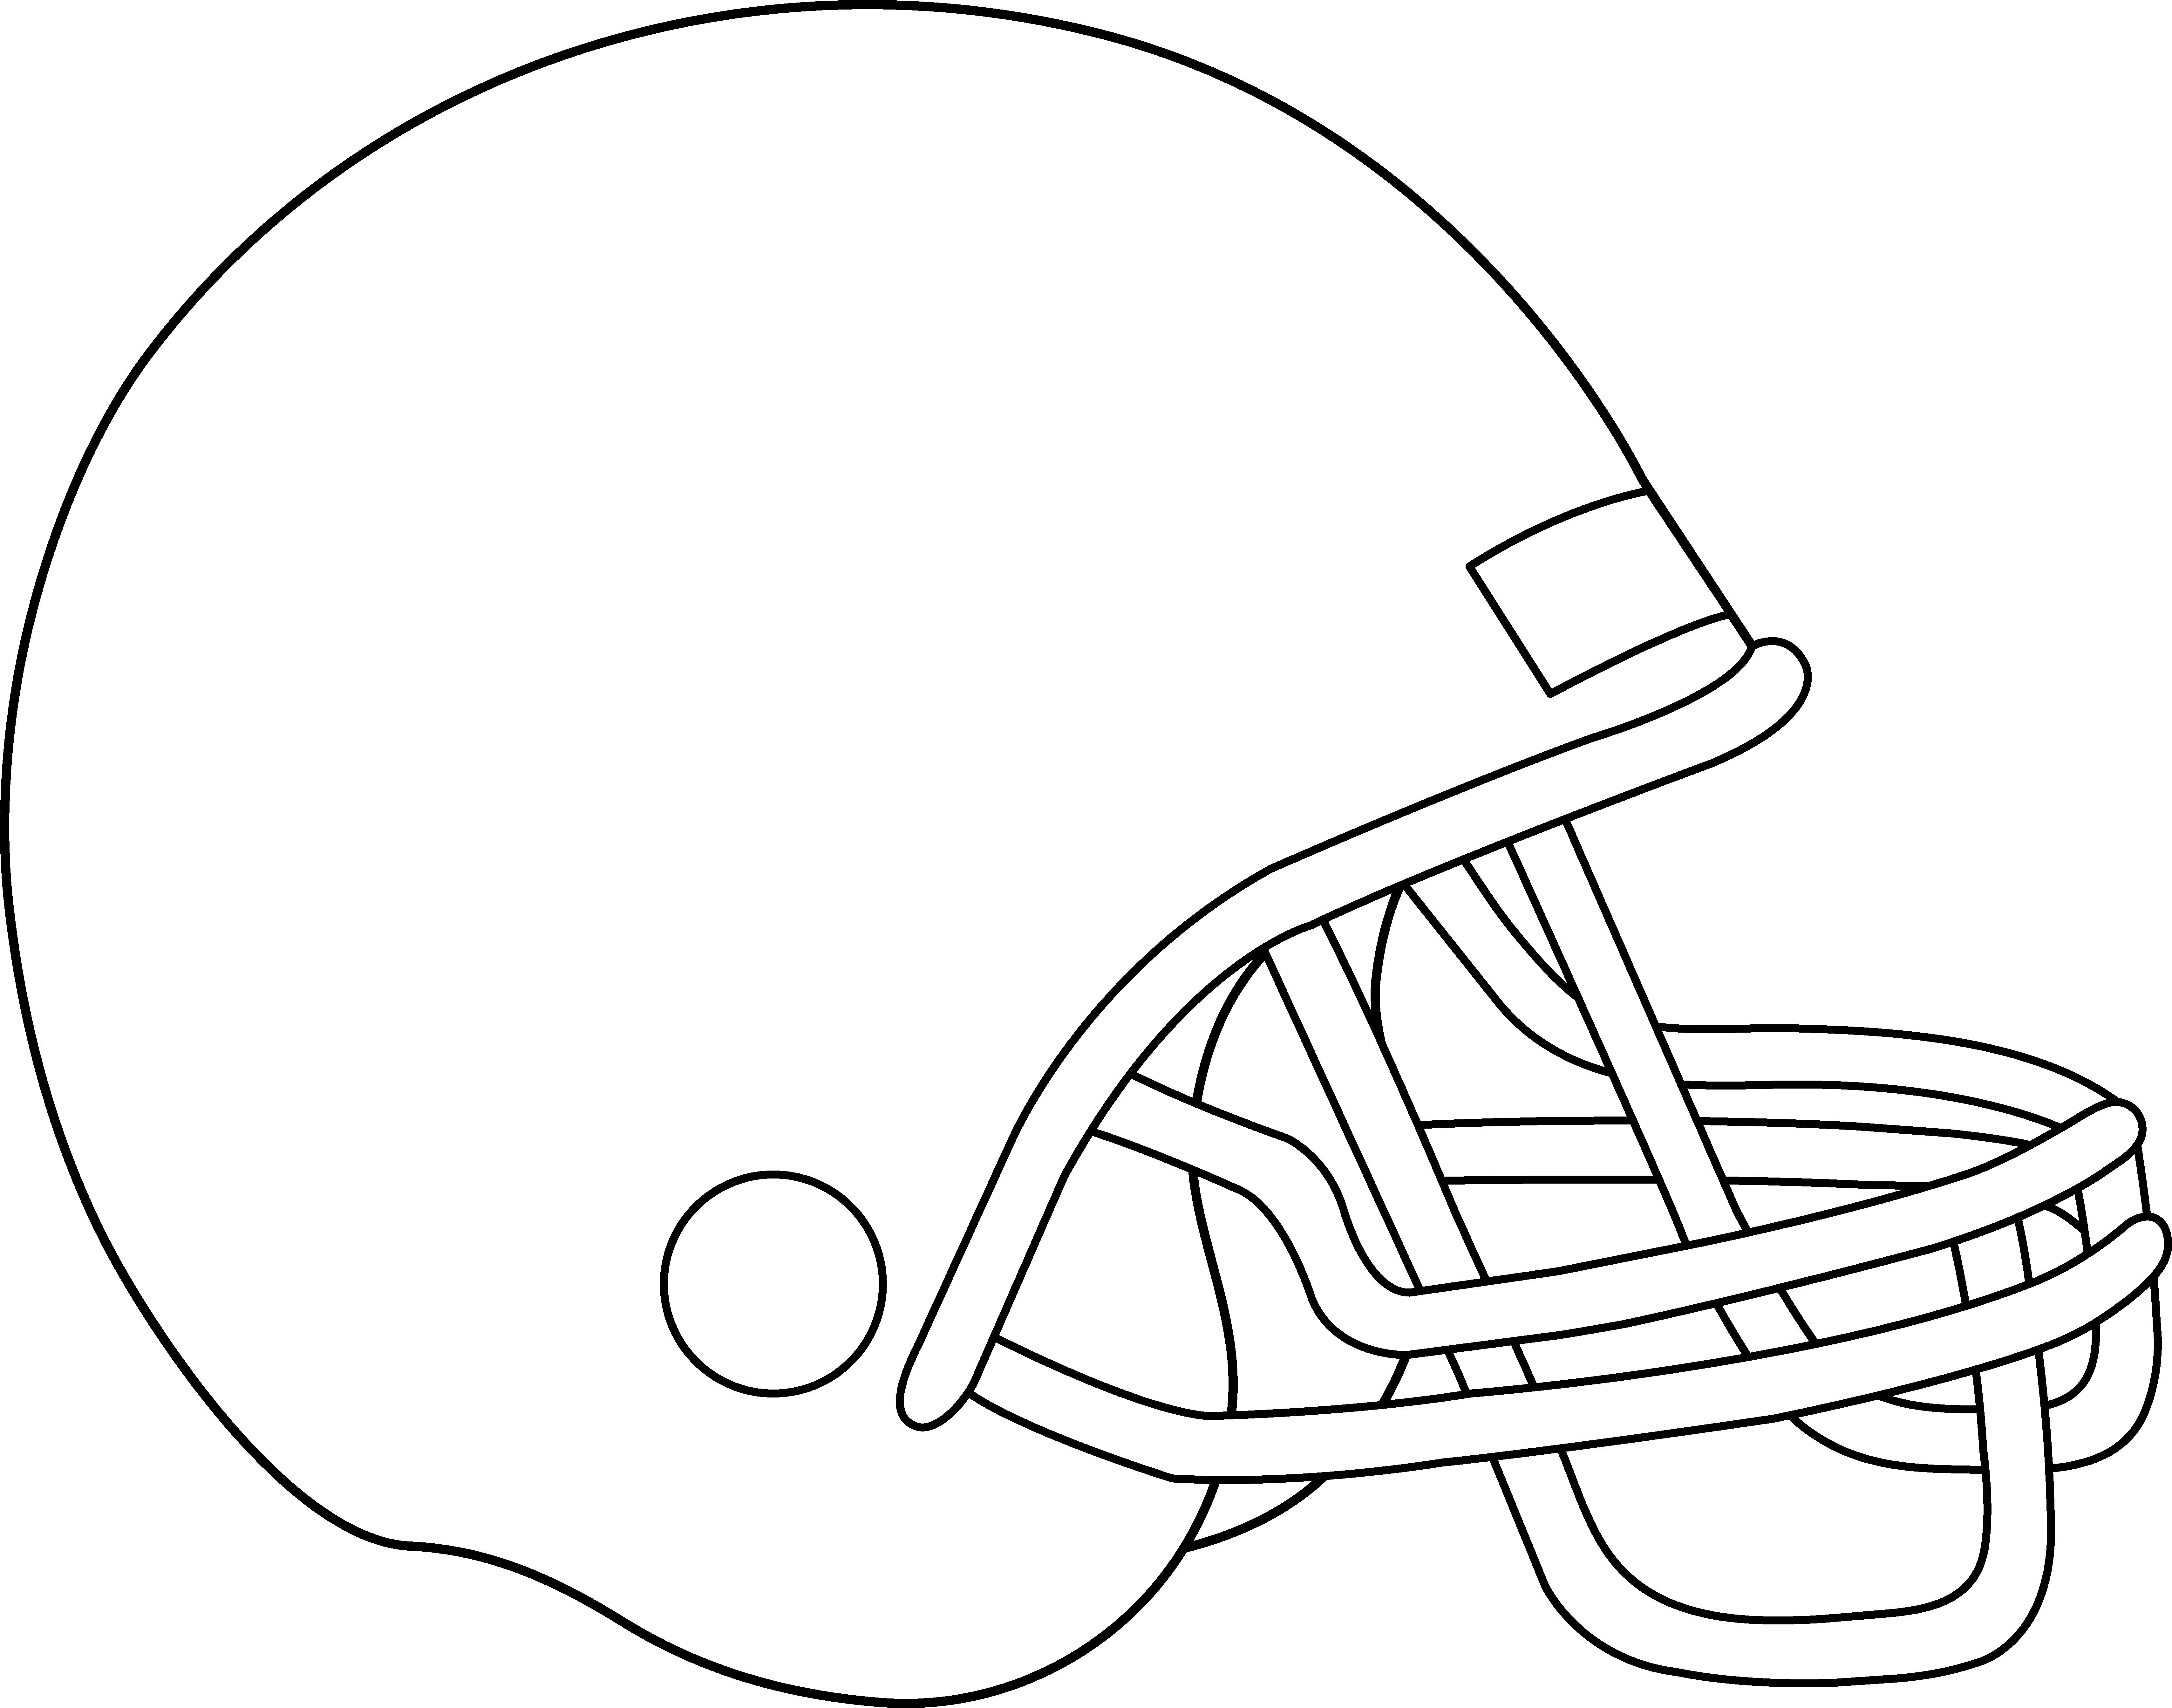 Free Football Helmet, Download Free Clip Art, Free Clip Art.